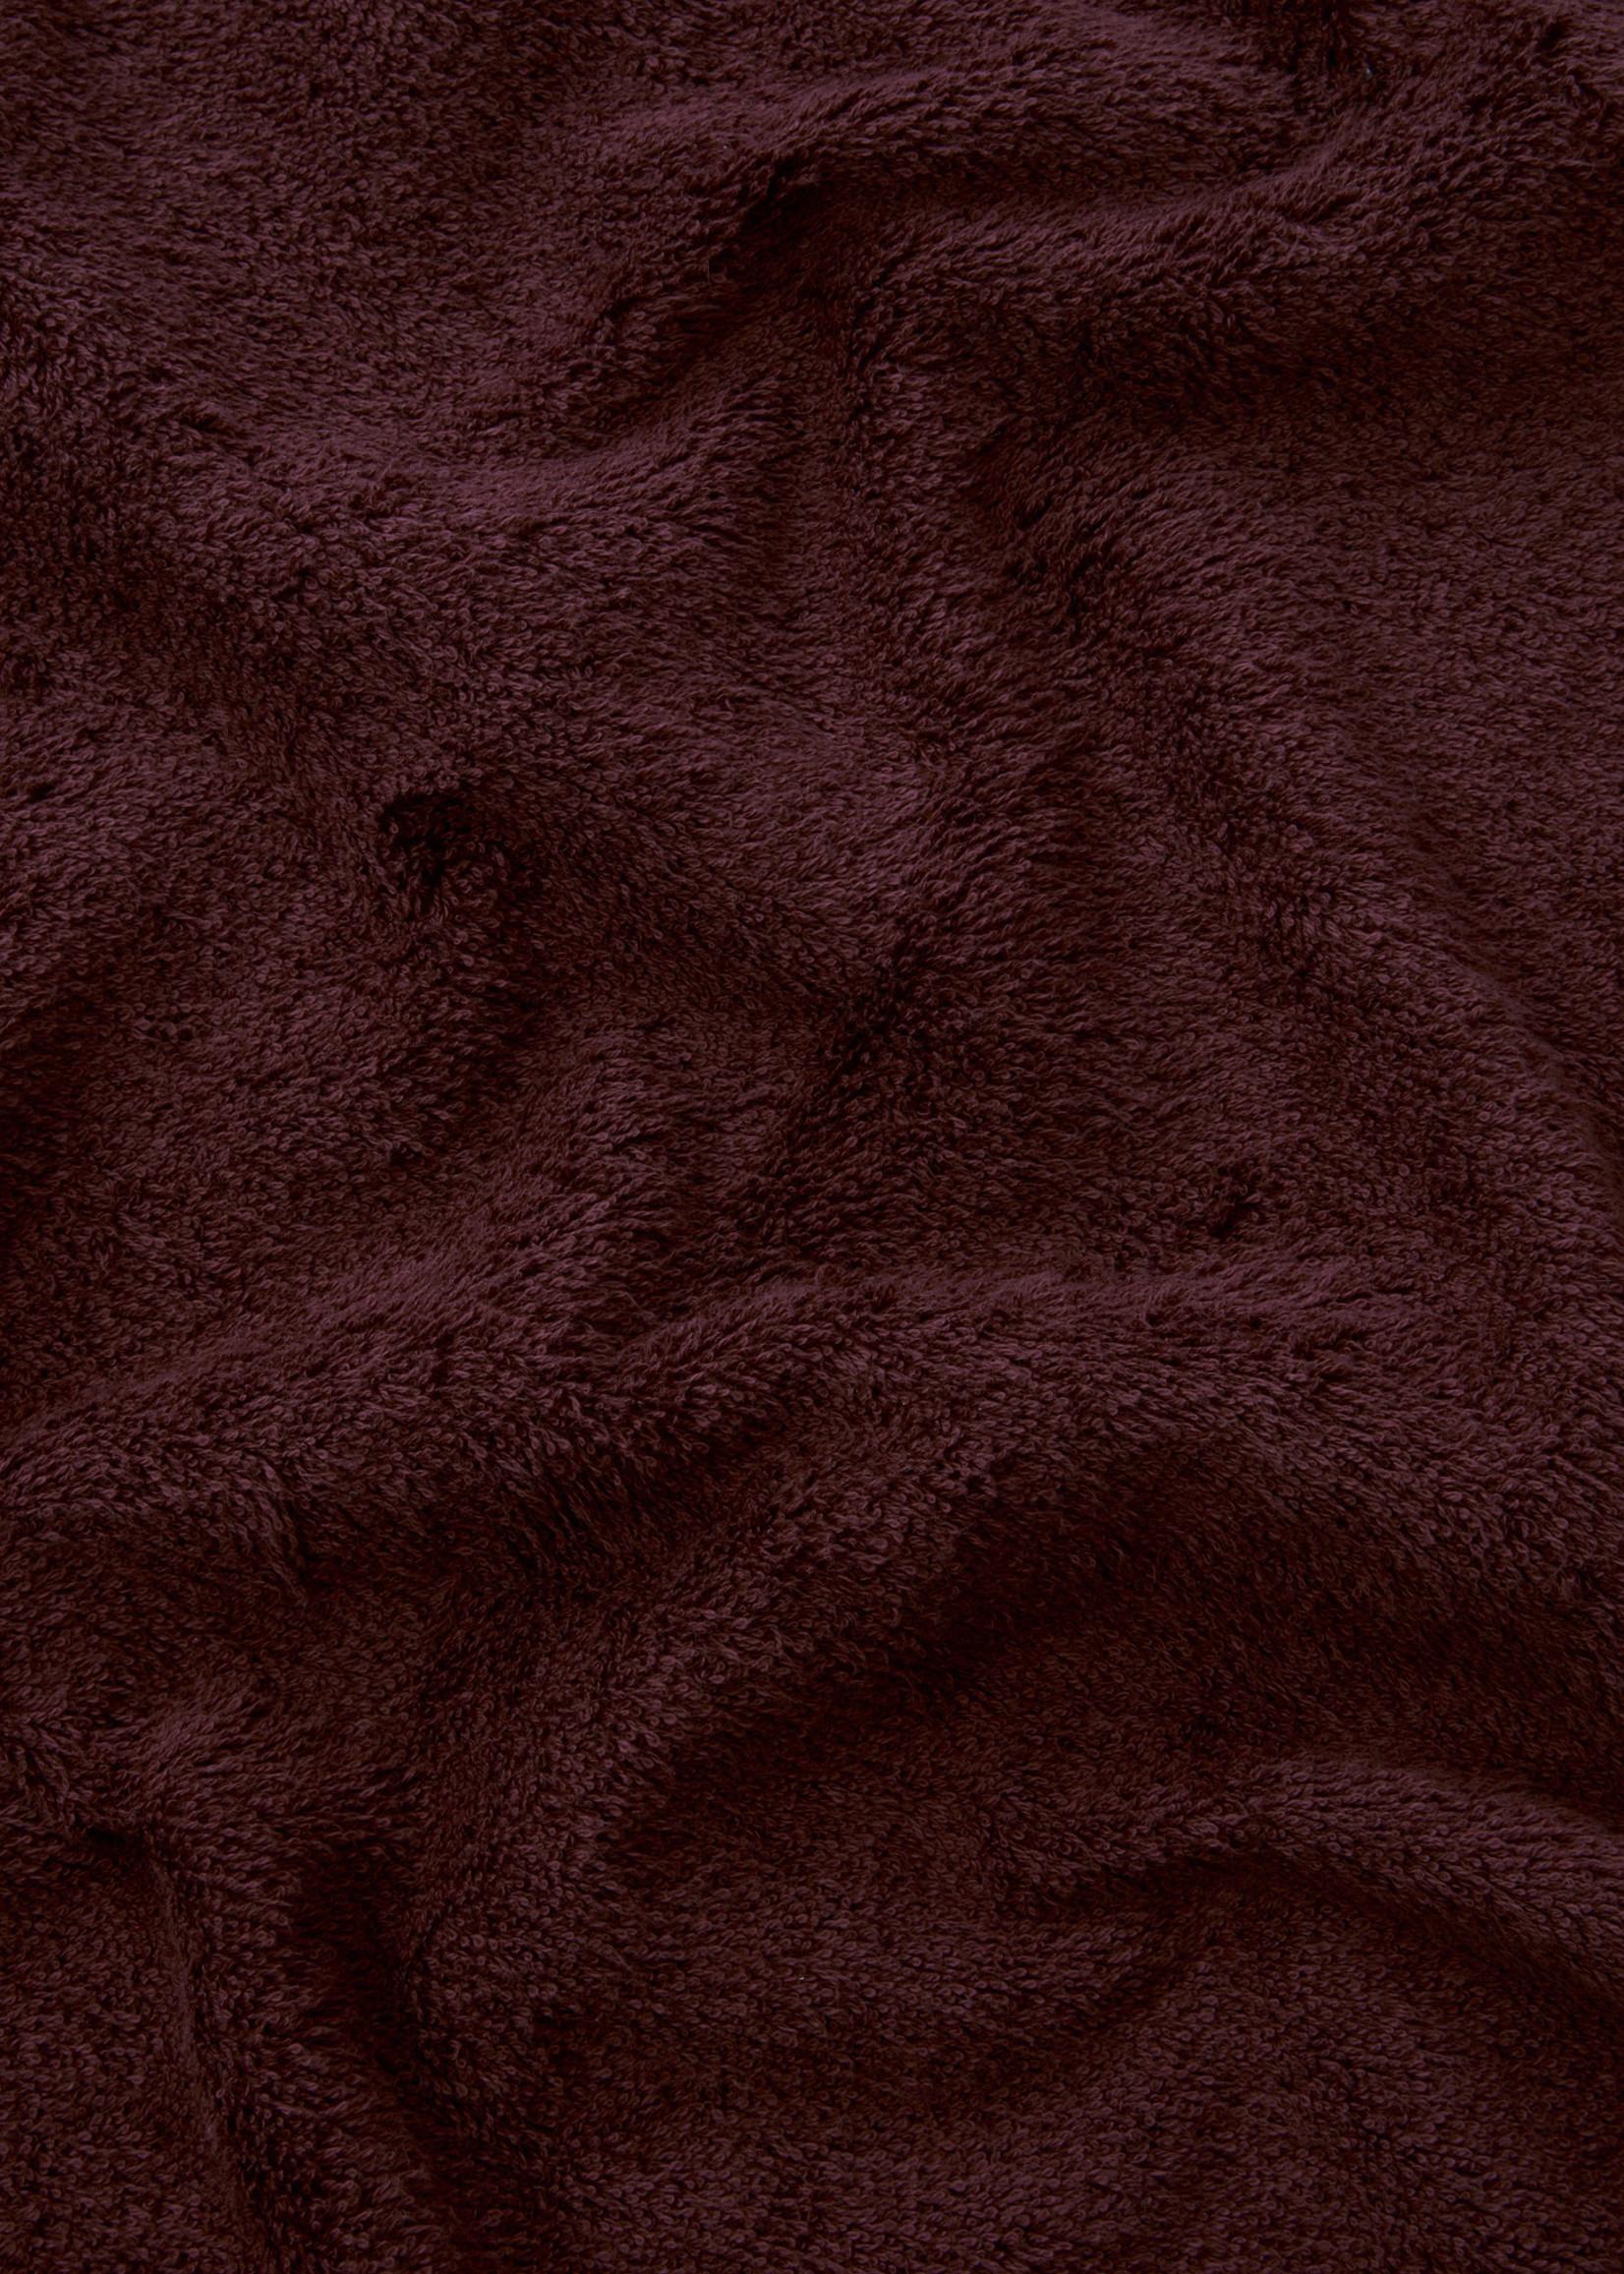 TEKLA TEKLA Organic Hand Towel in Plum Red